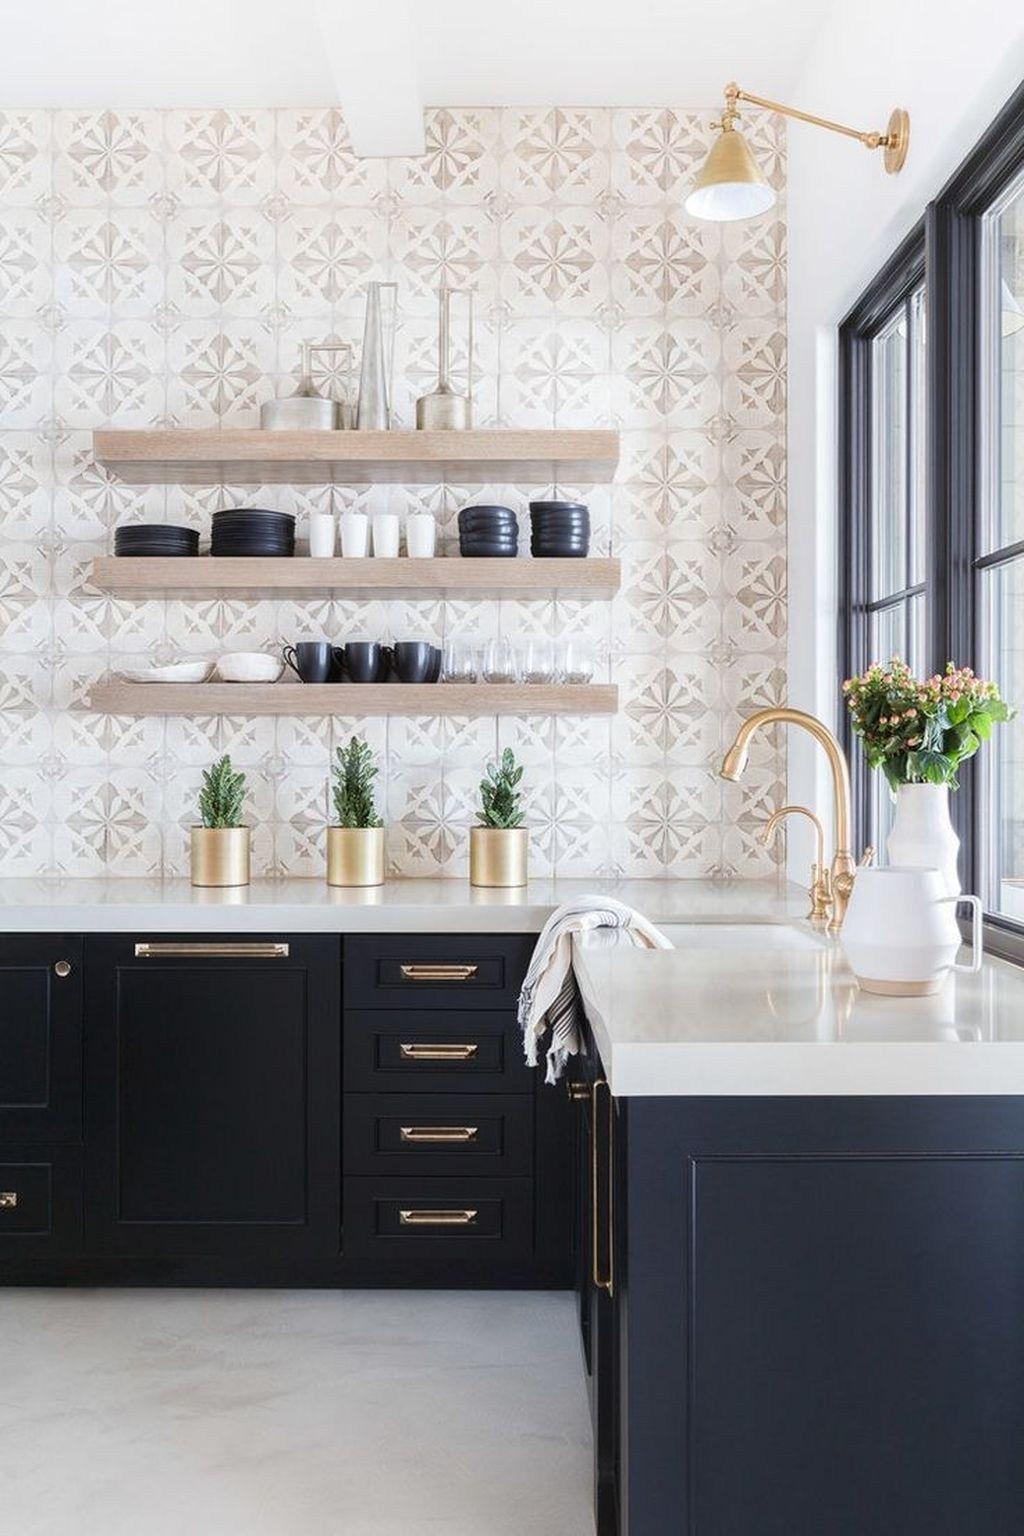 Cool Modern Farmhouse Kitchen Backsplash Ideas 13